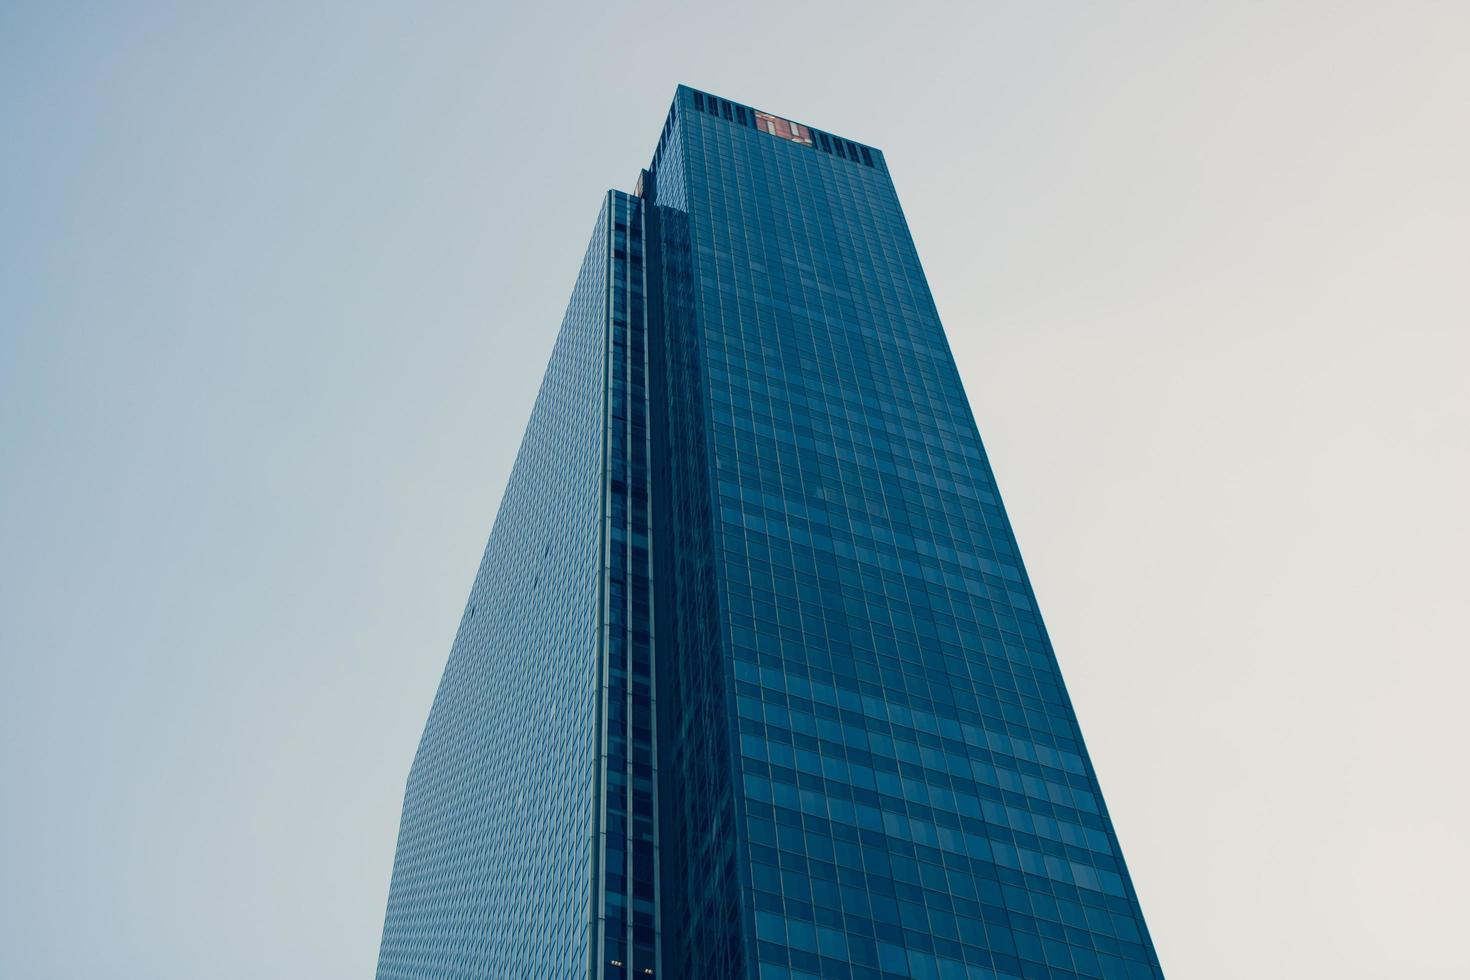 Skyscraper building under cloudy sky photo